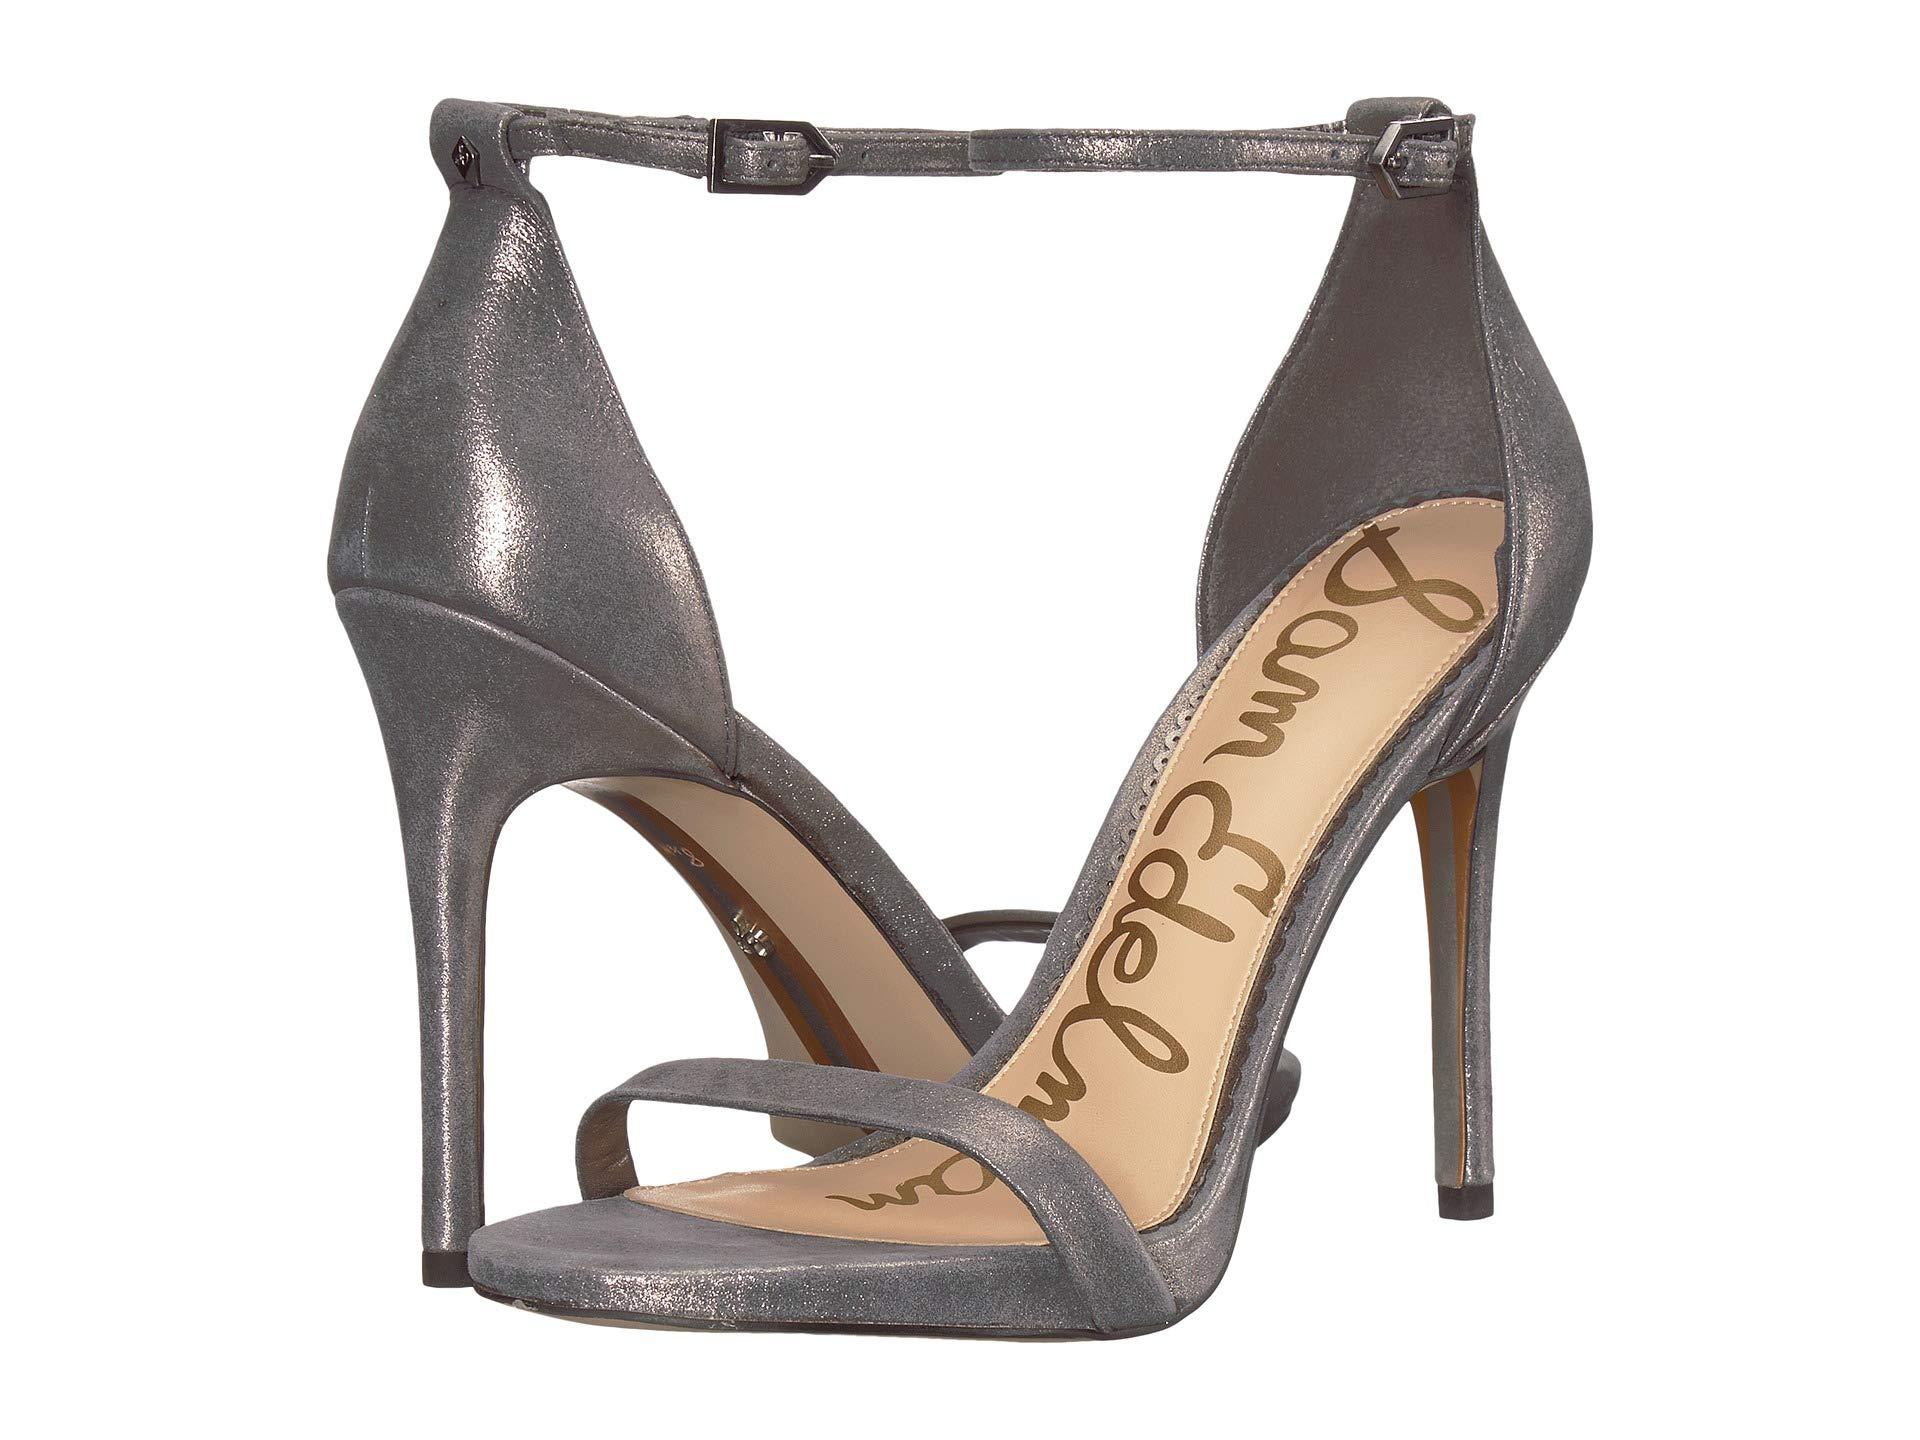 Pewter Metallic Strappy Ariella Sandal Spirit Heel Dark Sam Edelman Leather W17wqpYS